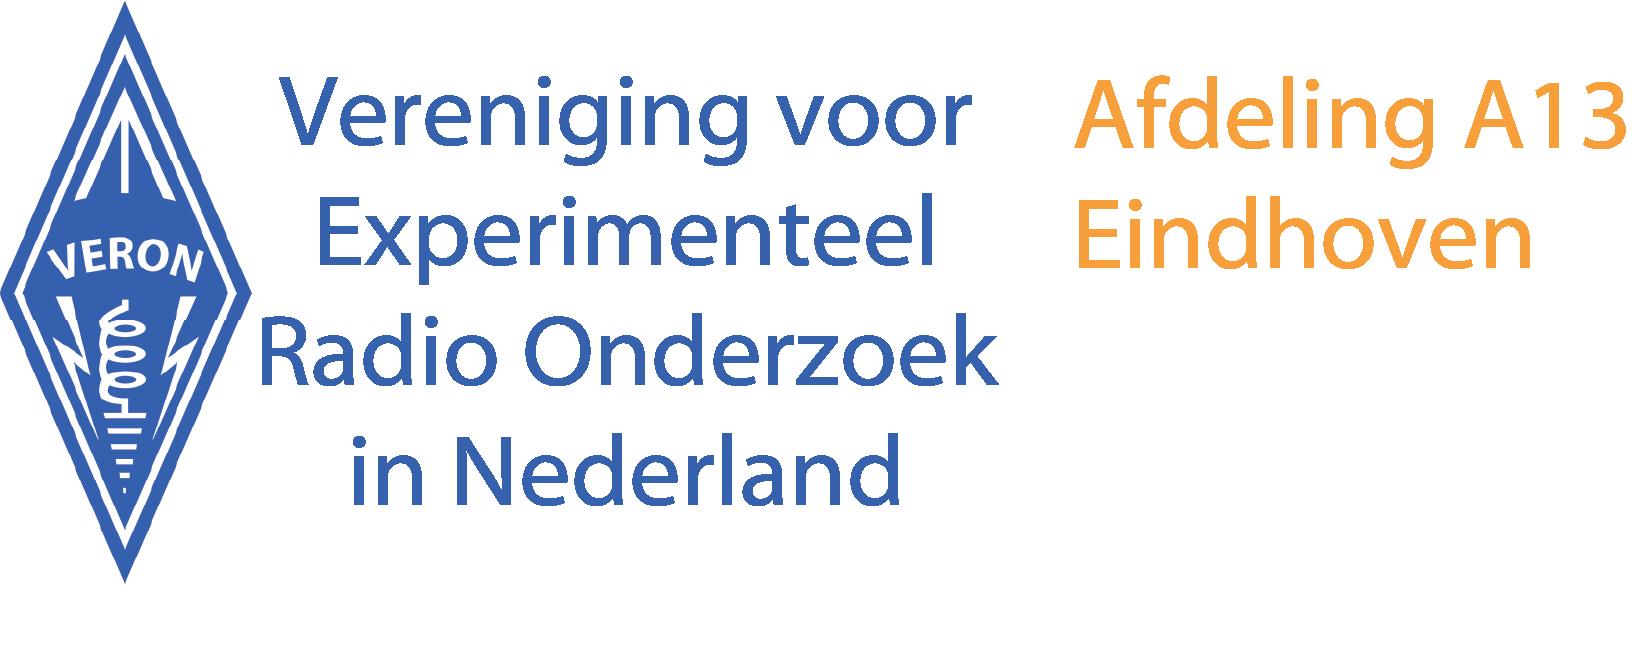 VERON a13 - Eindhoven